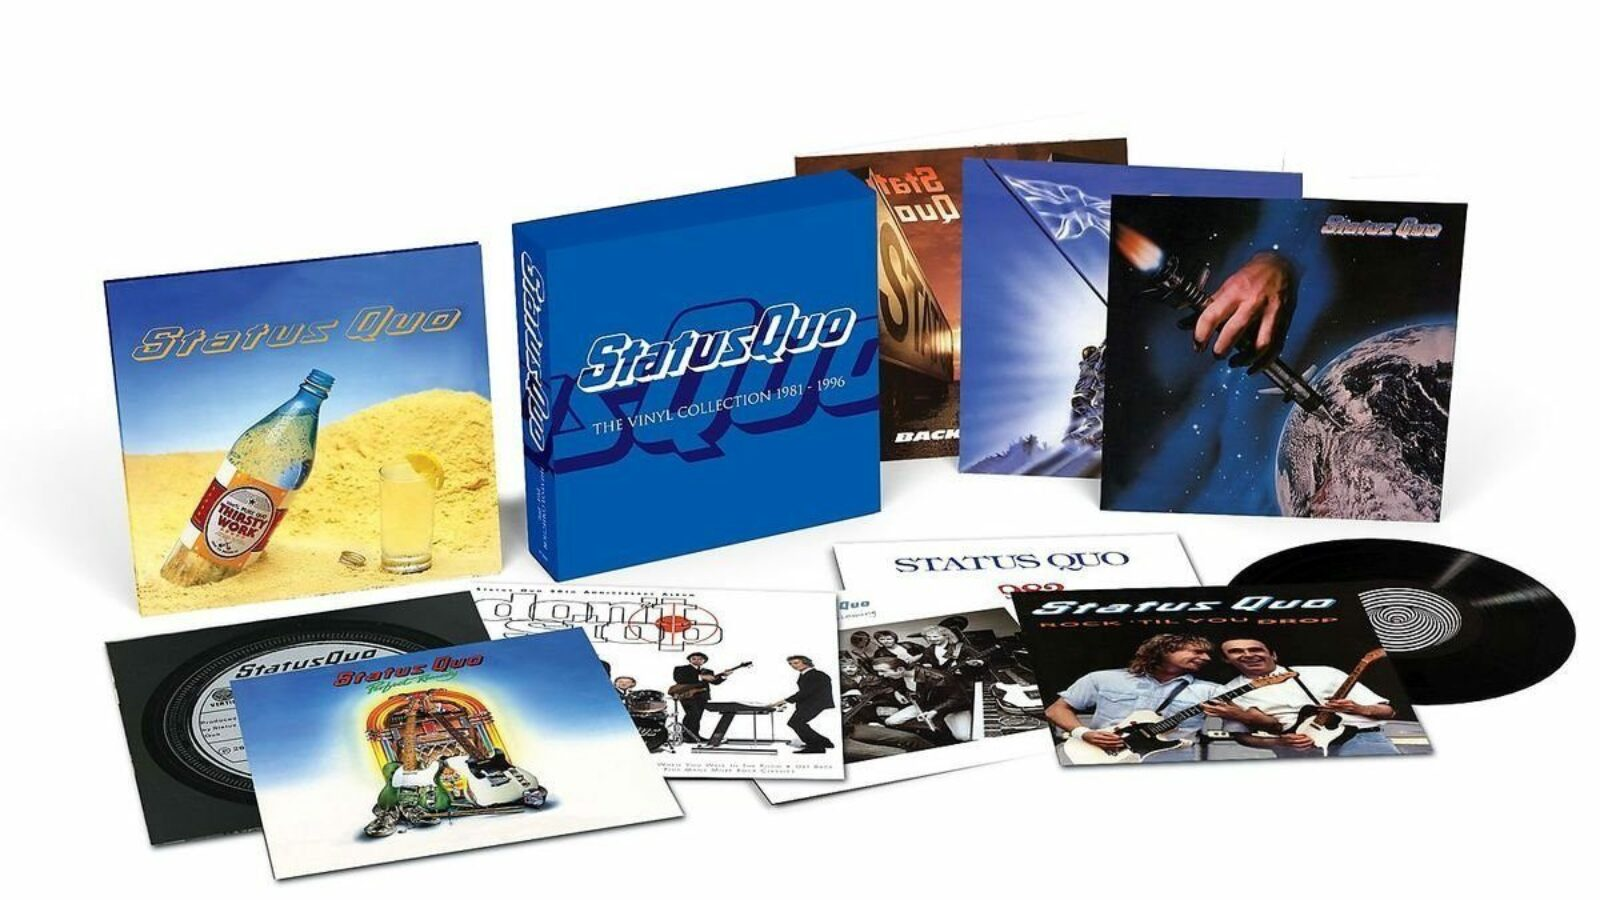 OXMOX CD-Tipp: STATUS QUO – The Vinyl Singles Collection 1972-1979/The Vinyl Collection 1981-1996